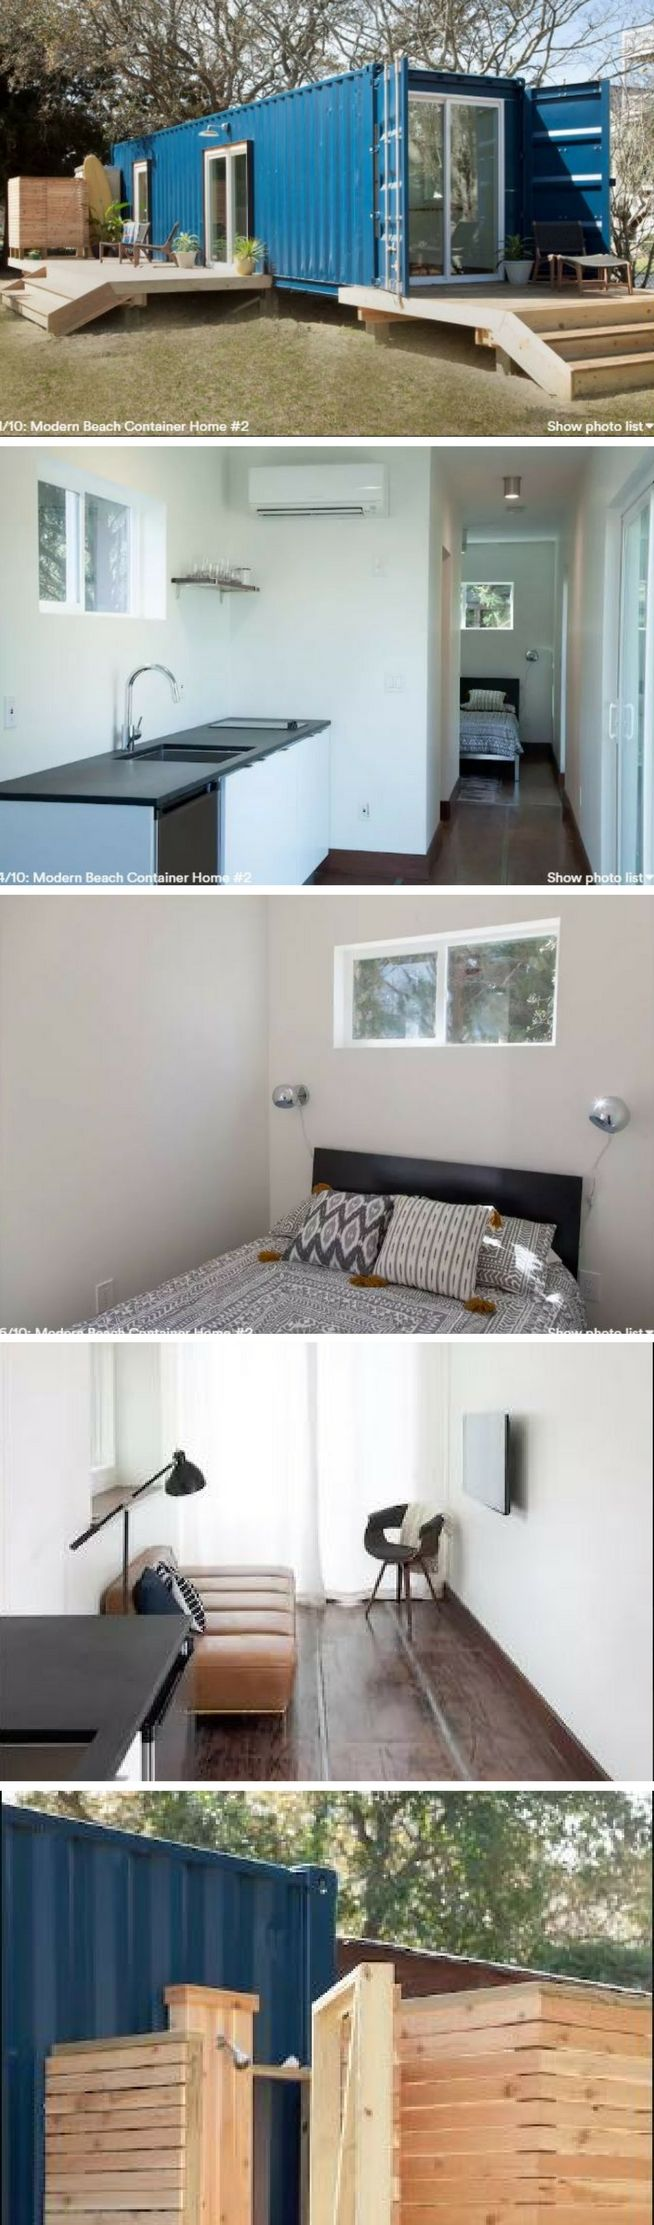 MODERN BEACH CONTAINER HOME #2